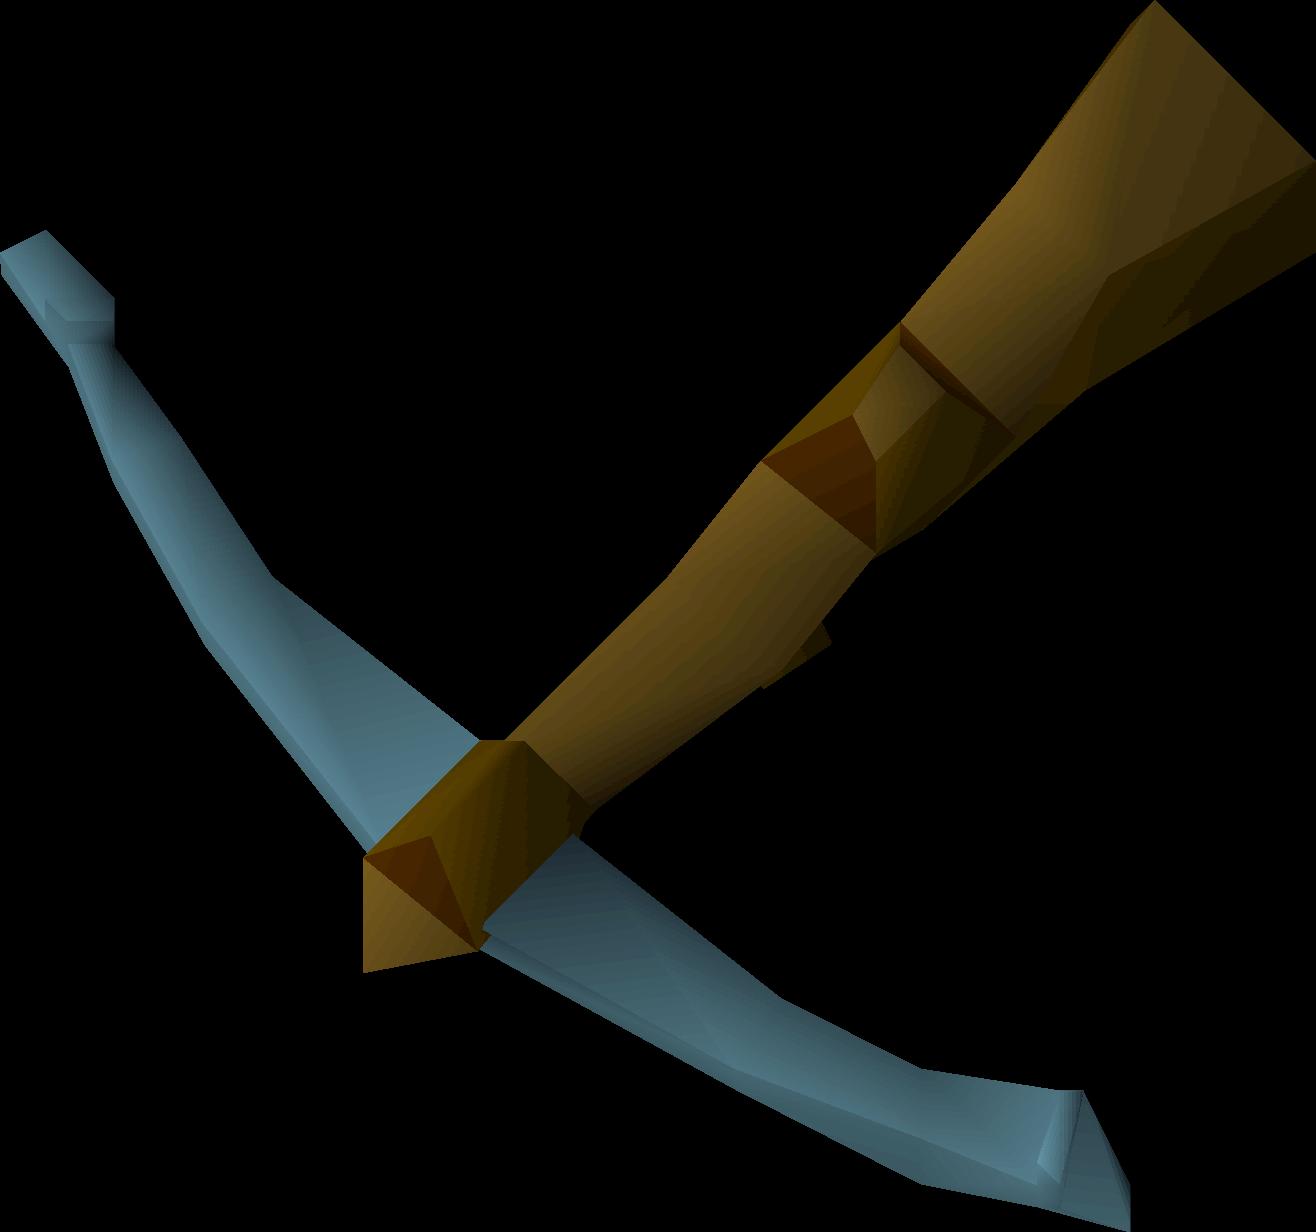 Runite crossbow (u)